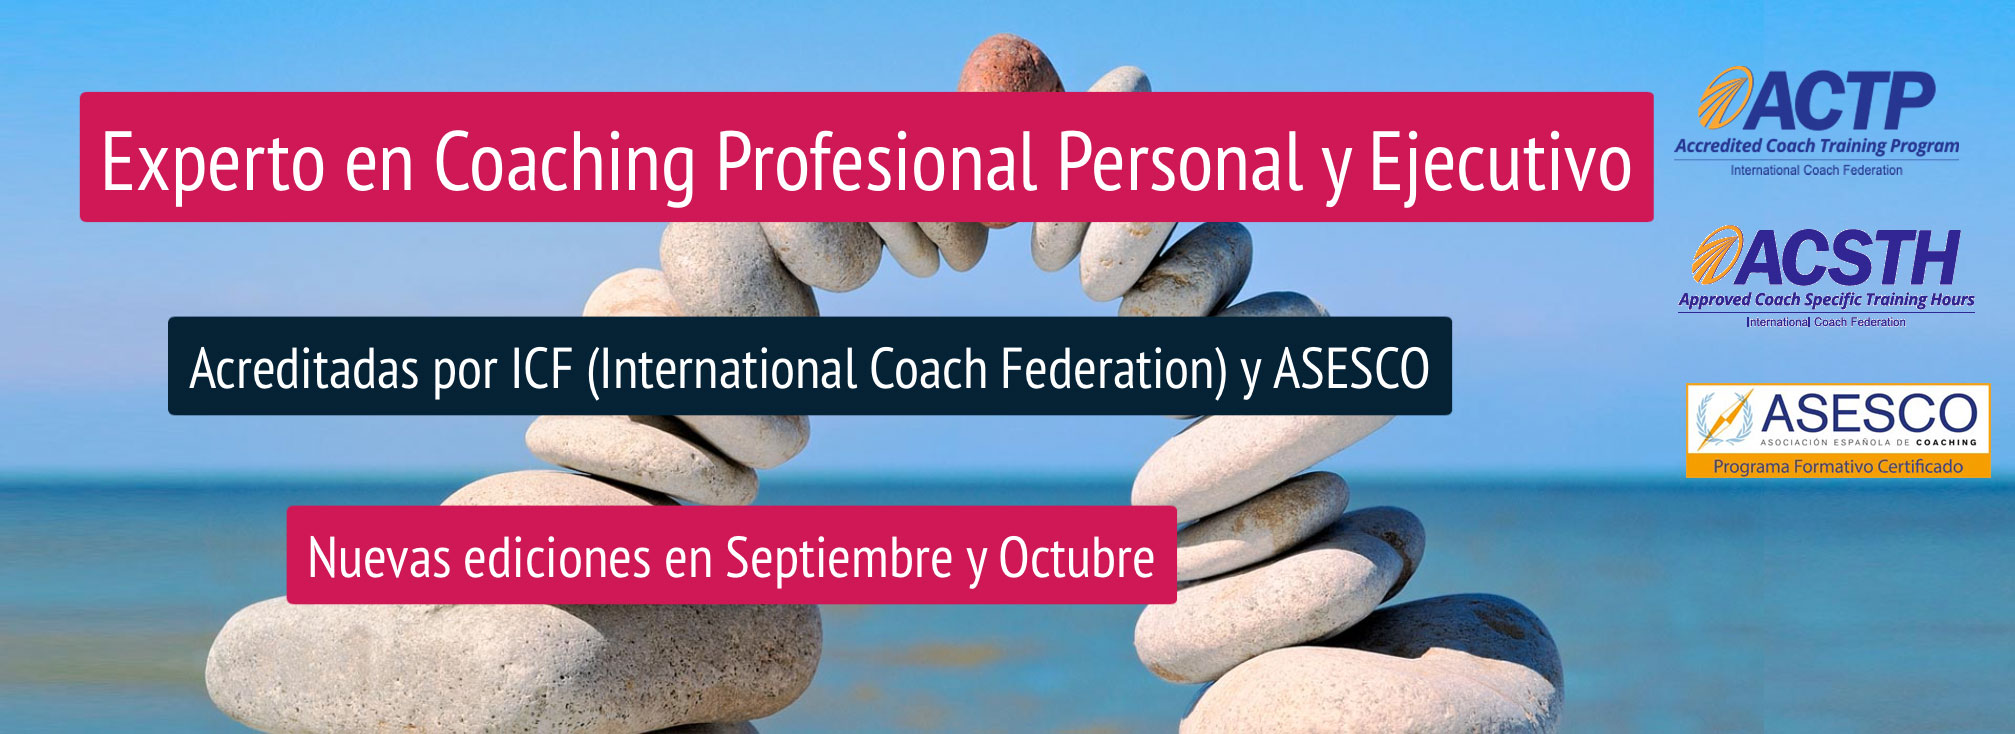 Experto en Coaching Profesional Personal y Ejecutivo